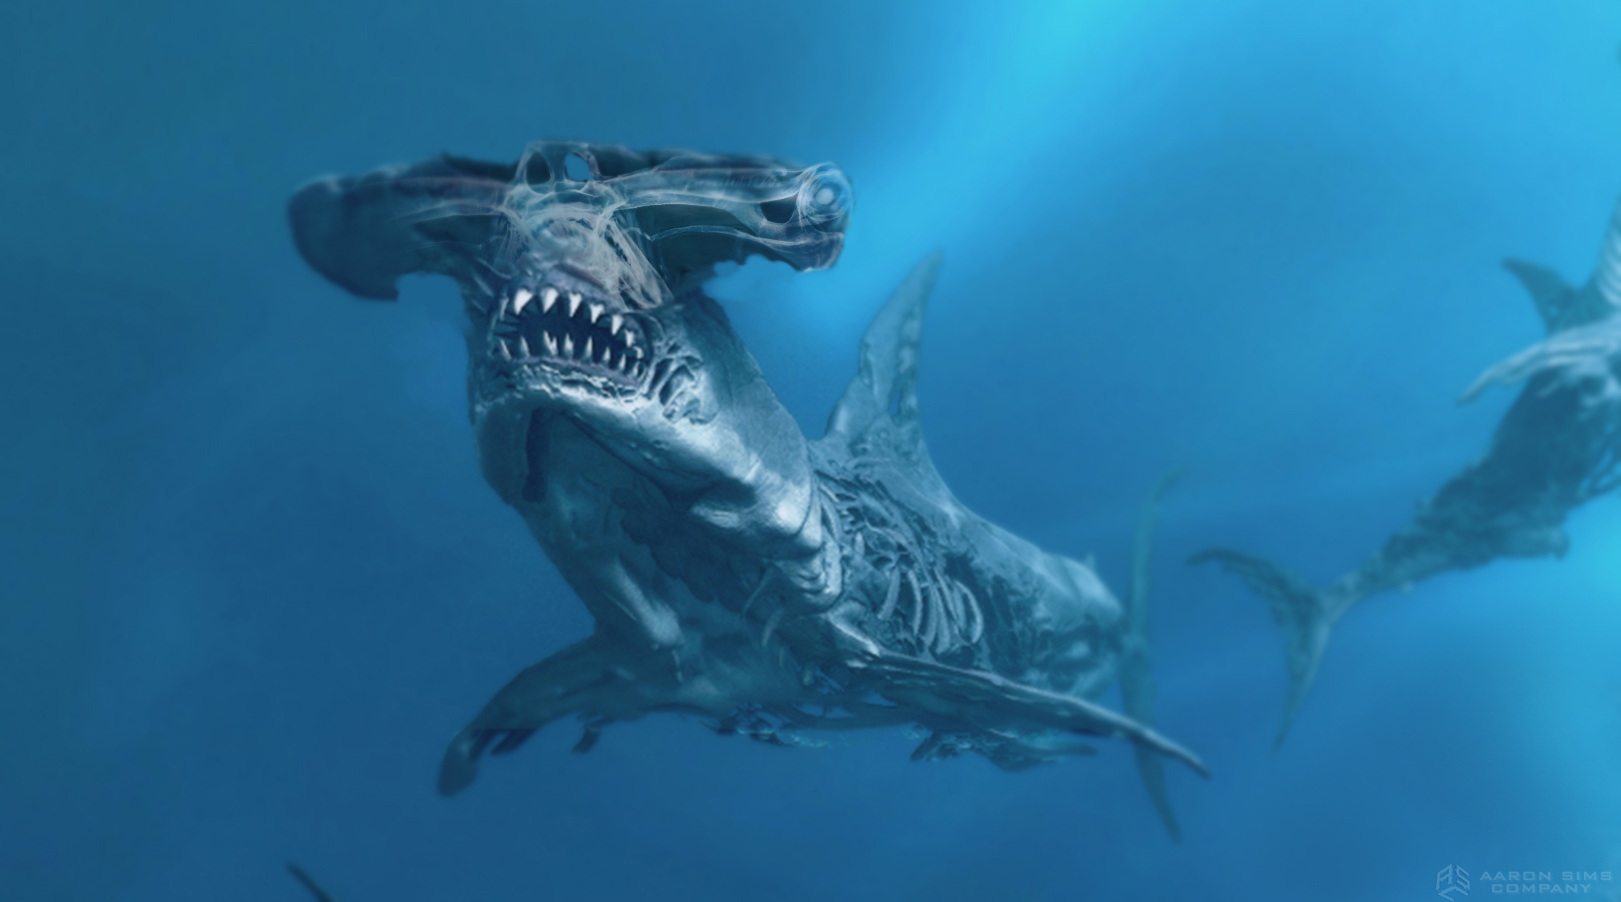 ASC_Pirates5_Sharks_v9_11-14-14.jpg